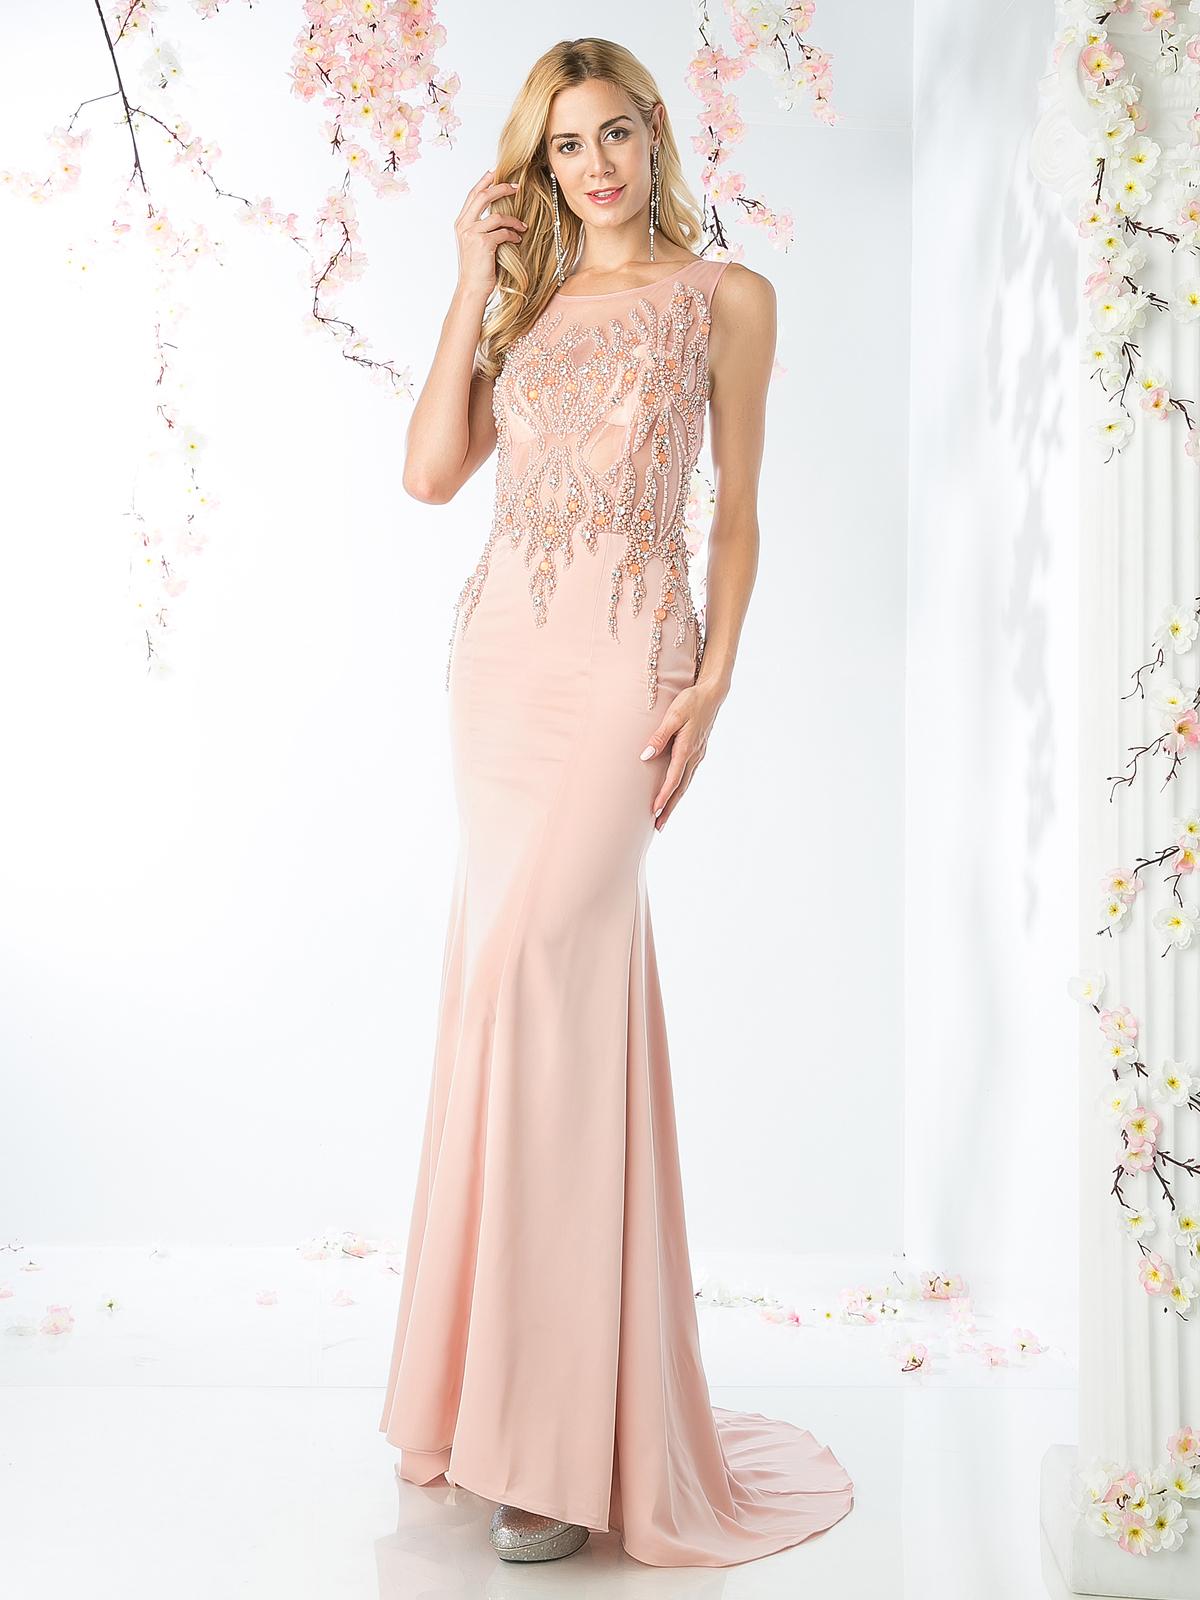 Illusion Neck A-line Evening Dress with Train   Sung Boutique L.A.